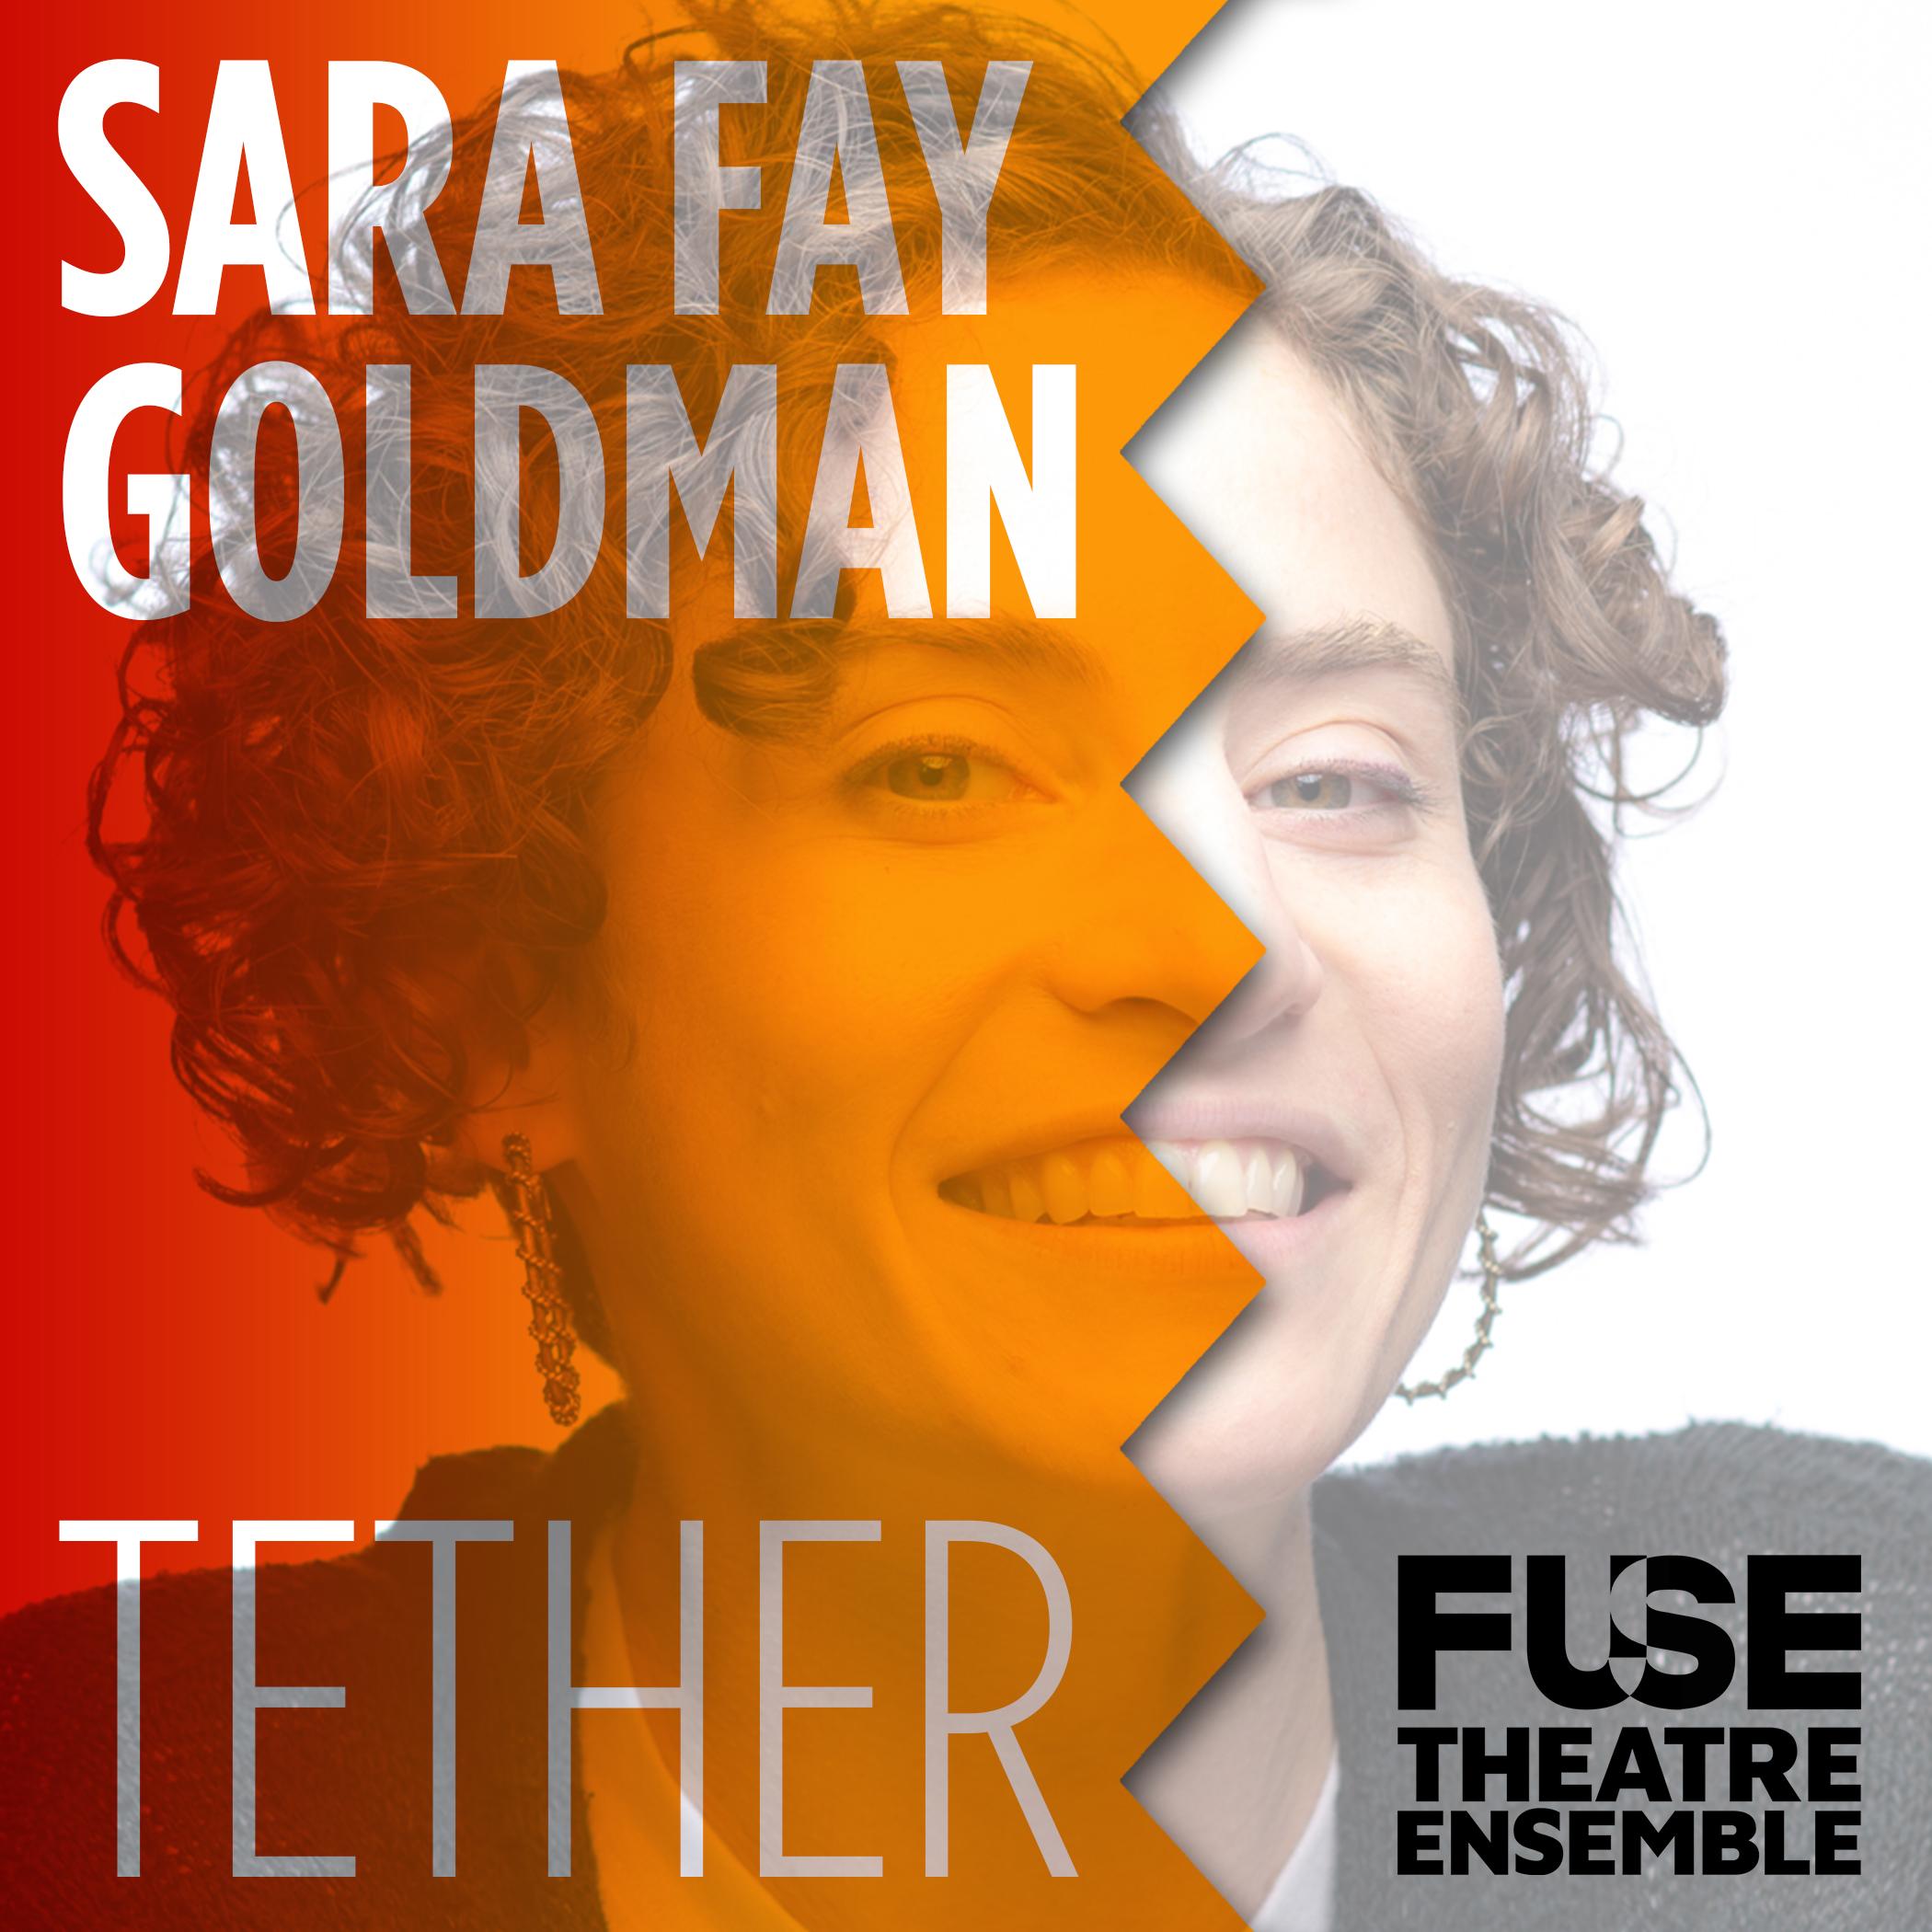 Tether_FUSE_Sara Fay Goldman_Greg Parkinson.jpg